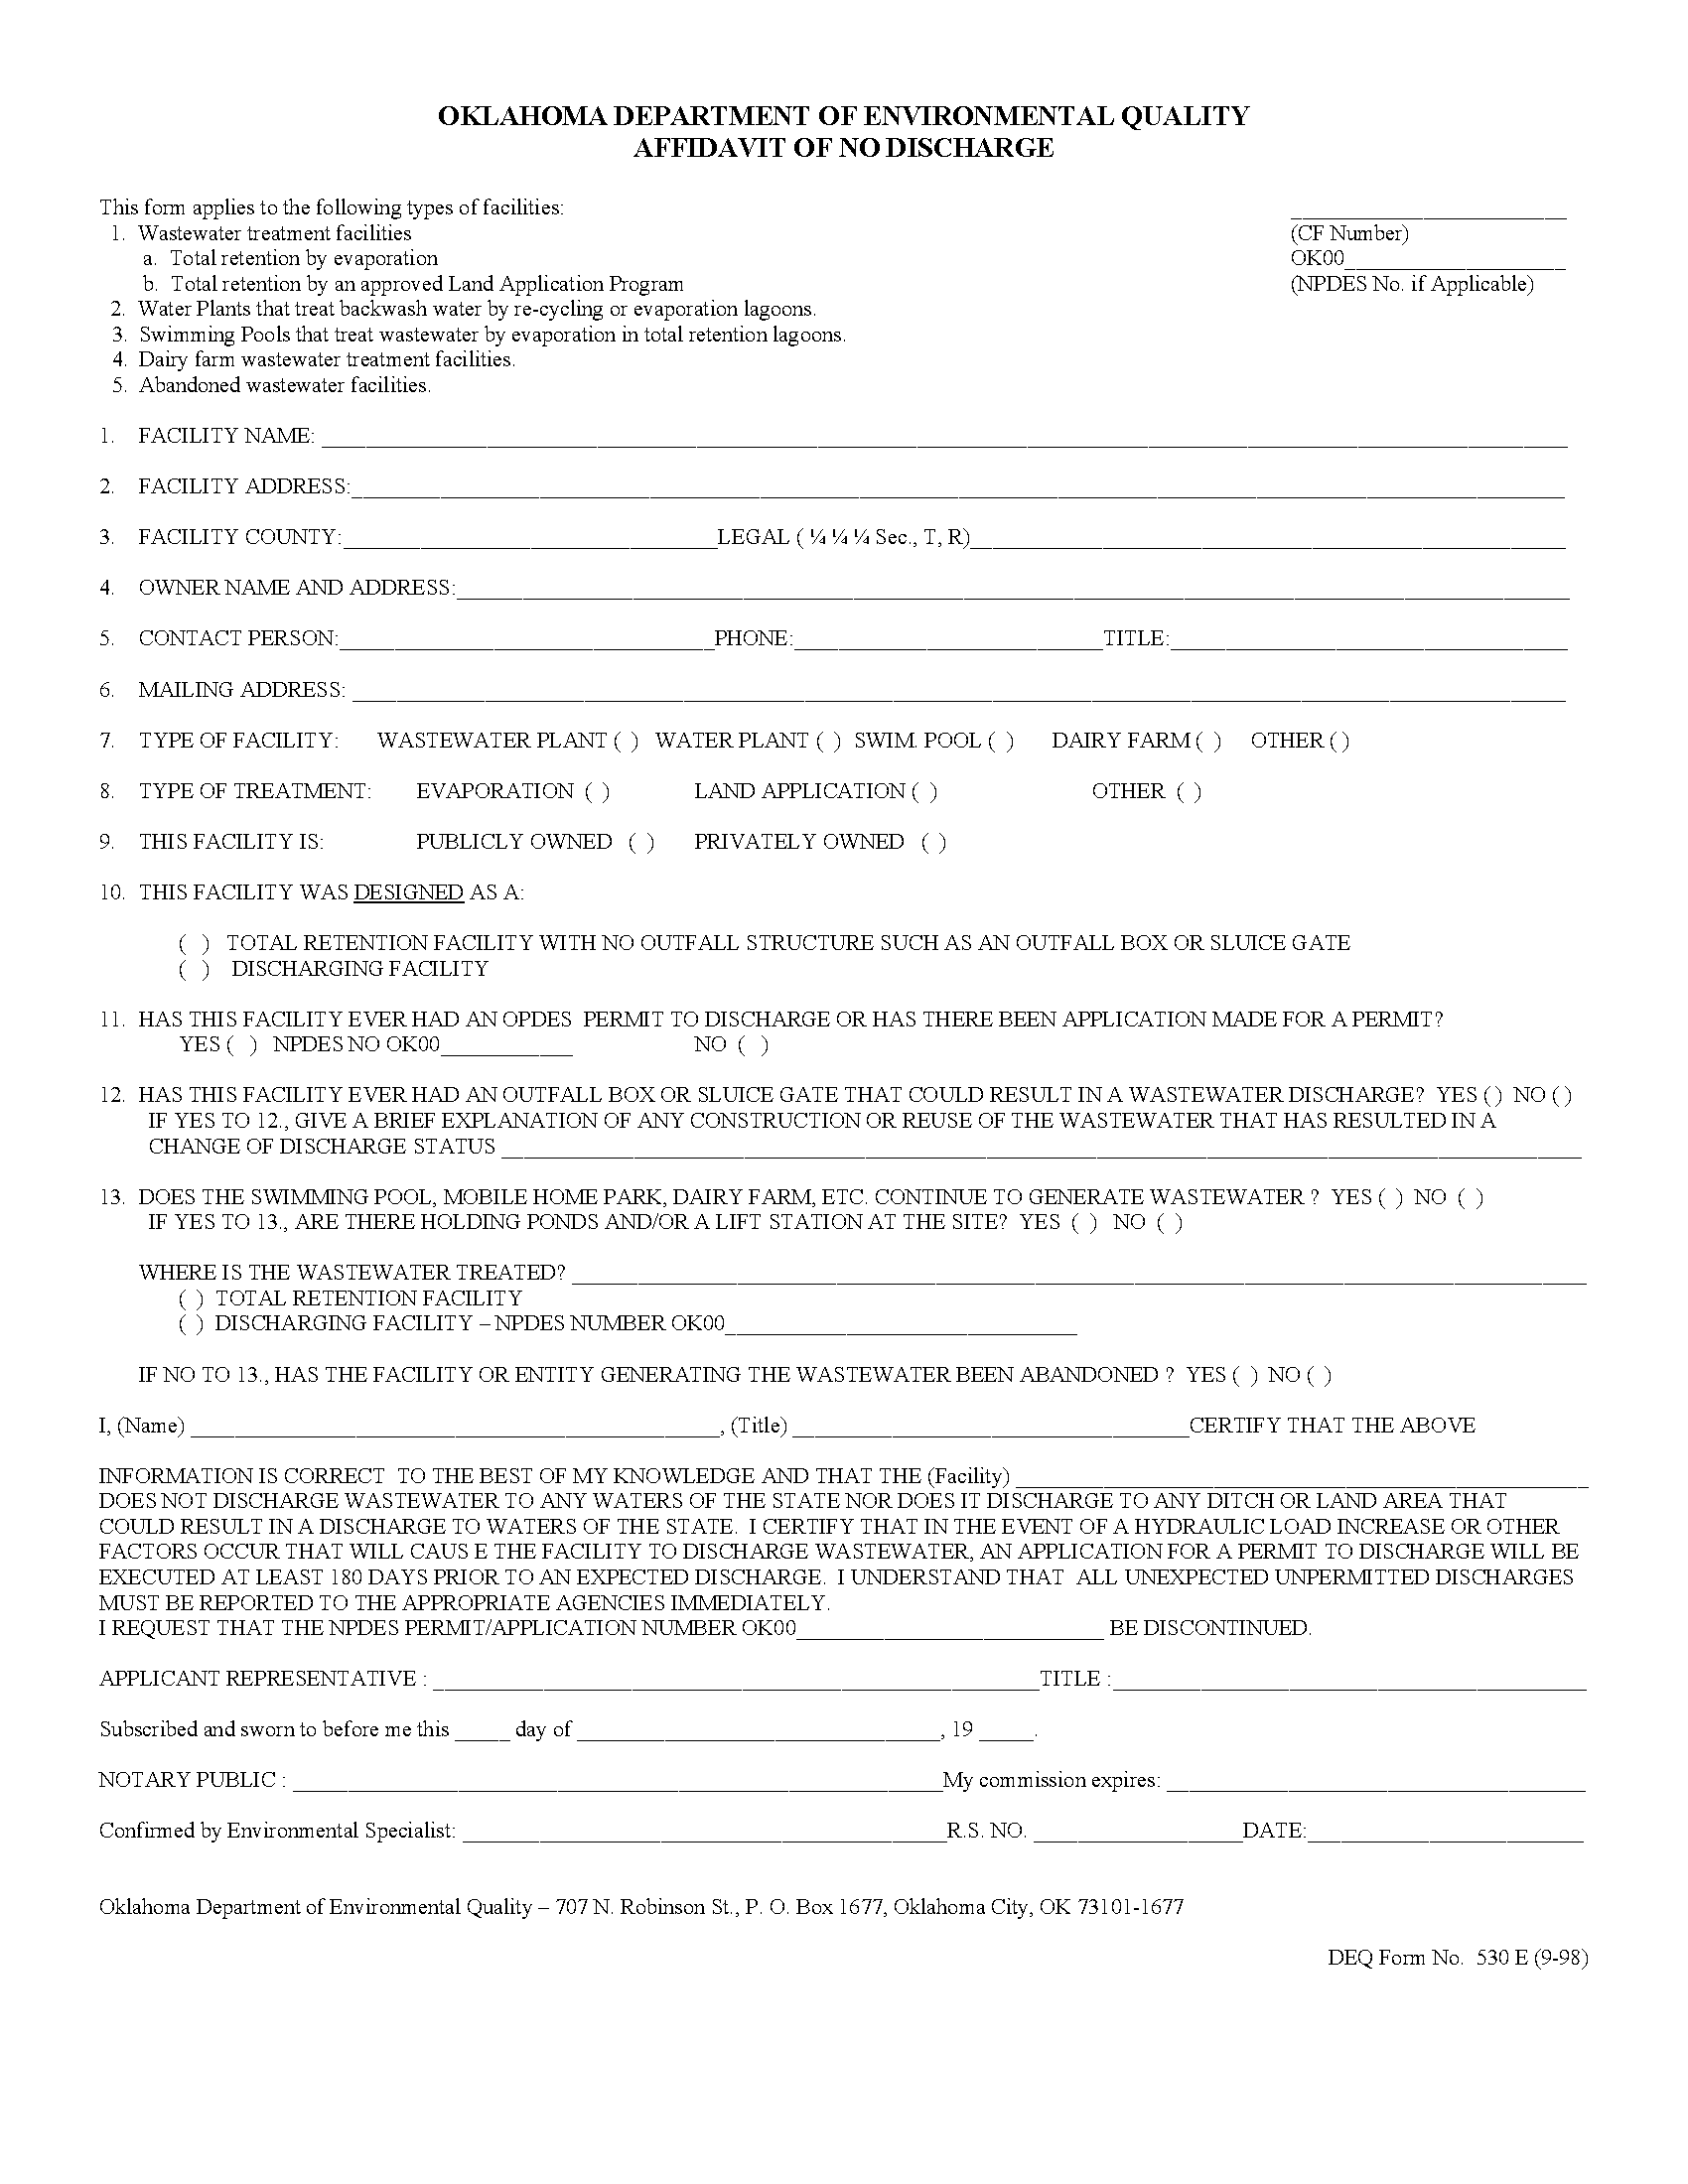 Affidavit of No Discharge - Forms OK Gov - Oklahoma Digital Prairie